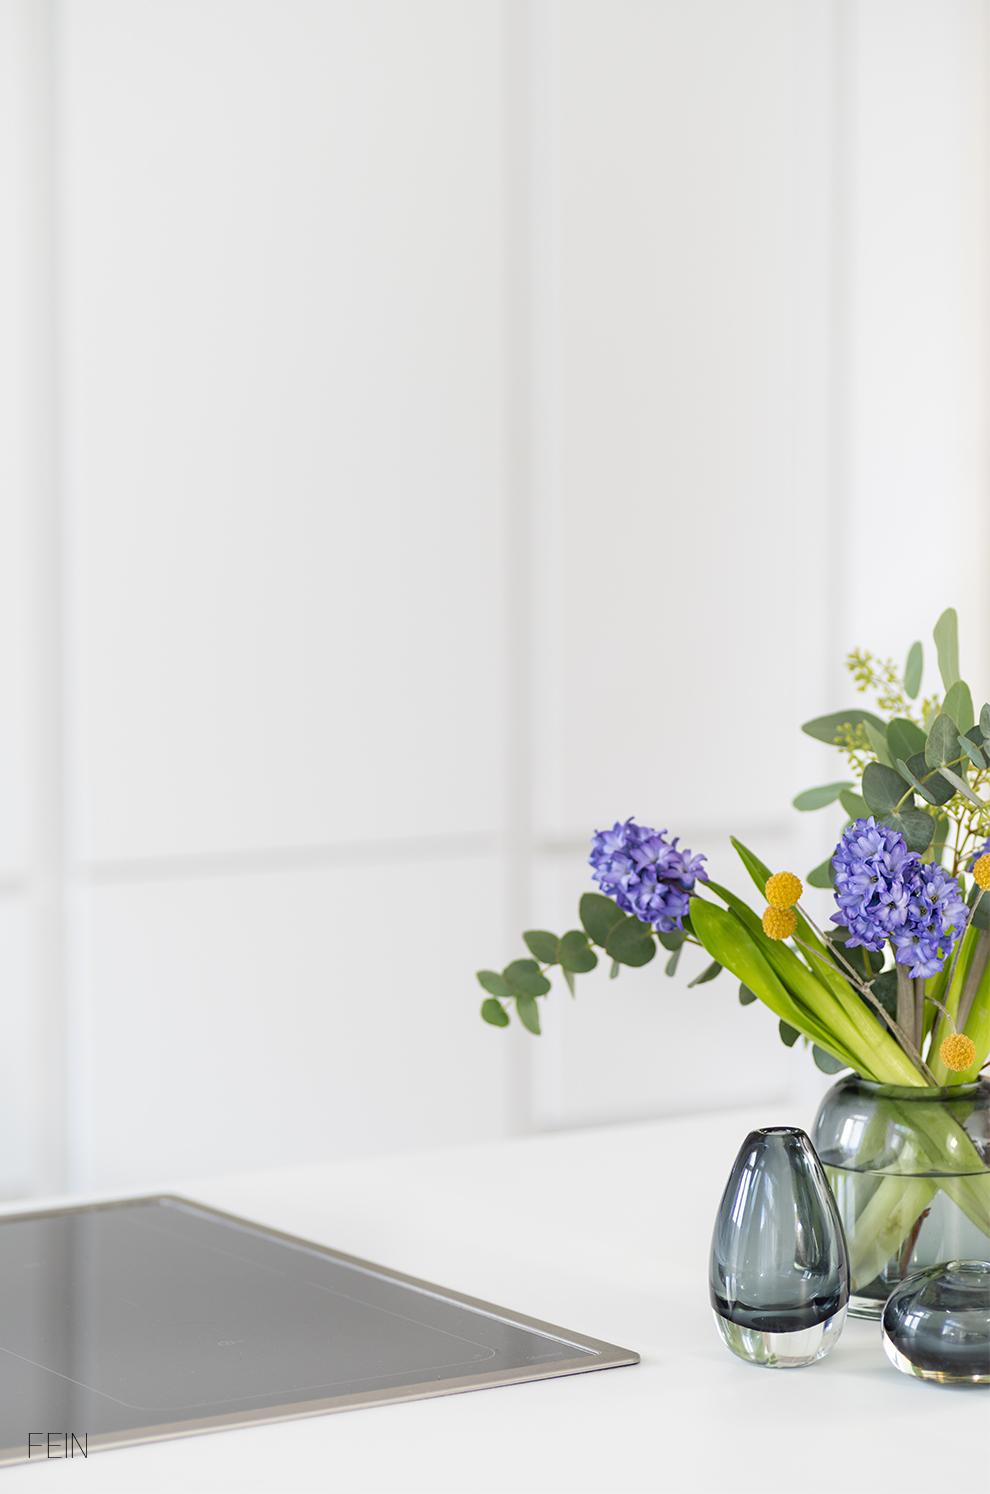 Pflanzen Whiteliving